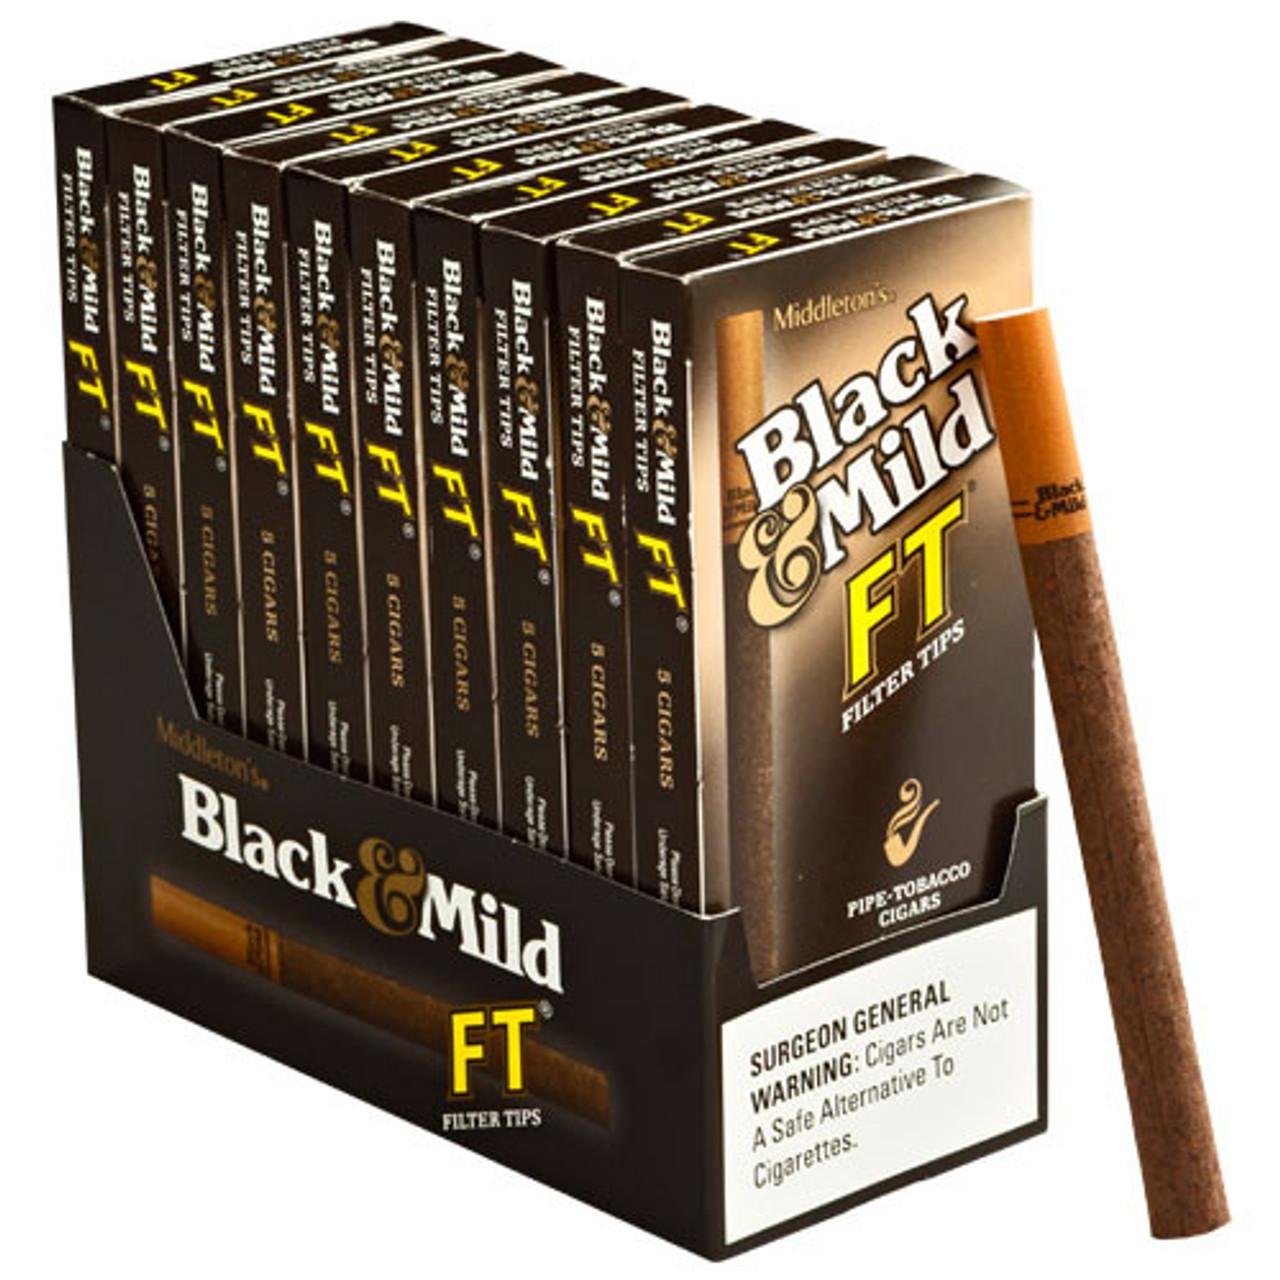 Black and Mild Filter Tip Cigars (10 packs of 5) - Natural